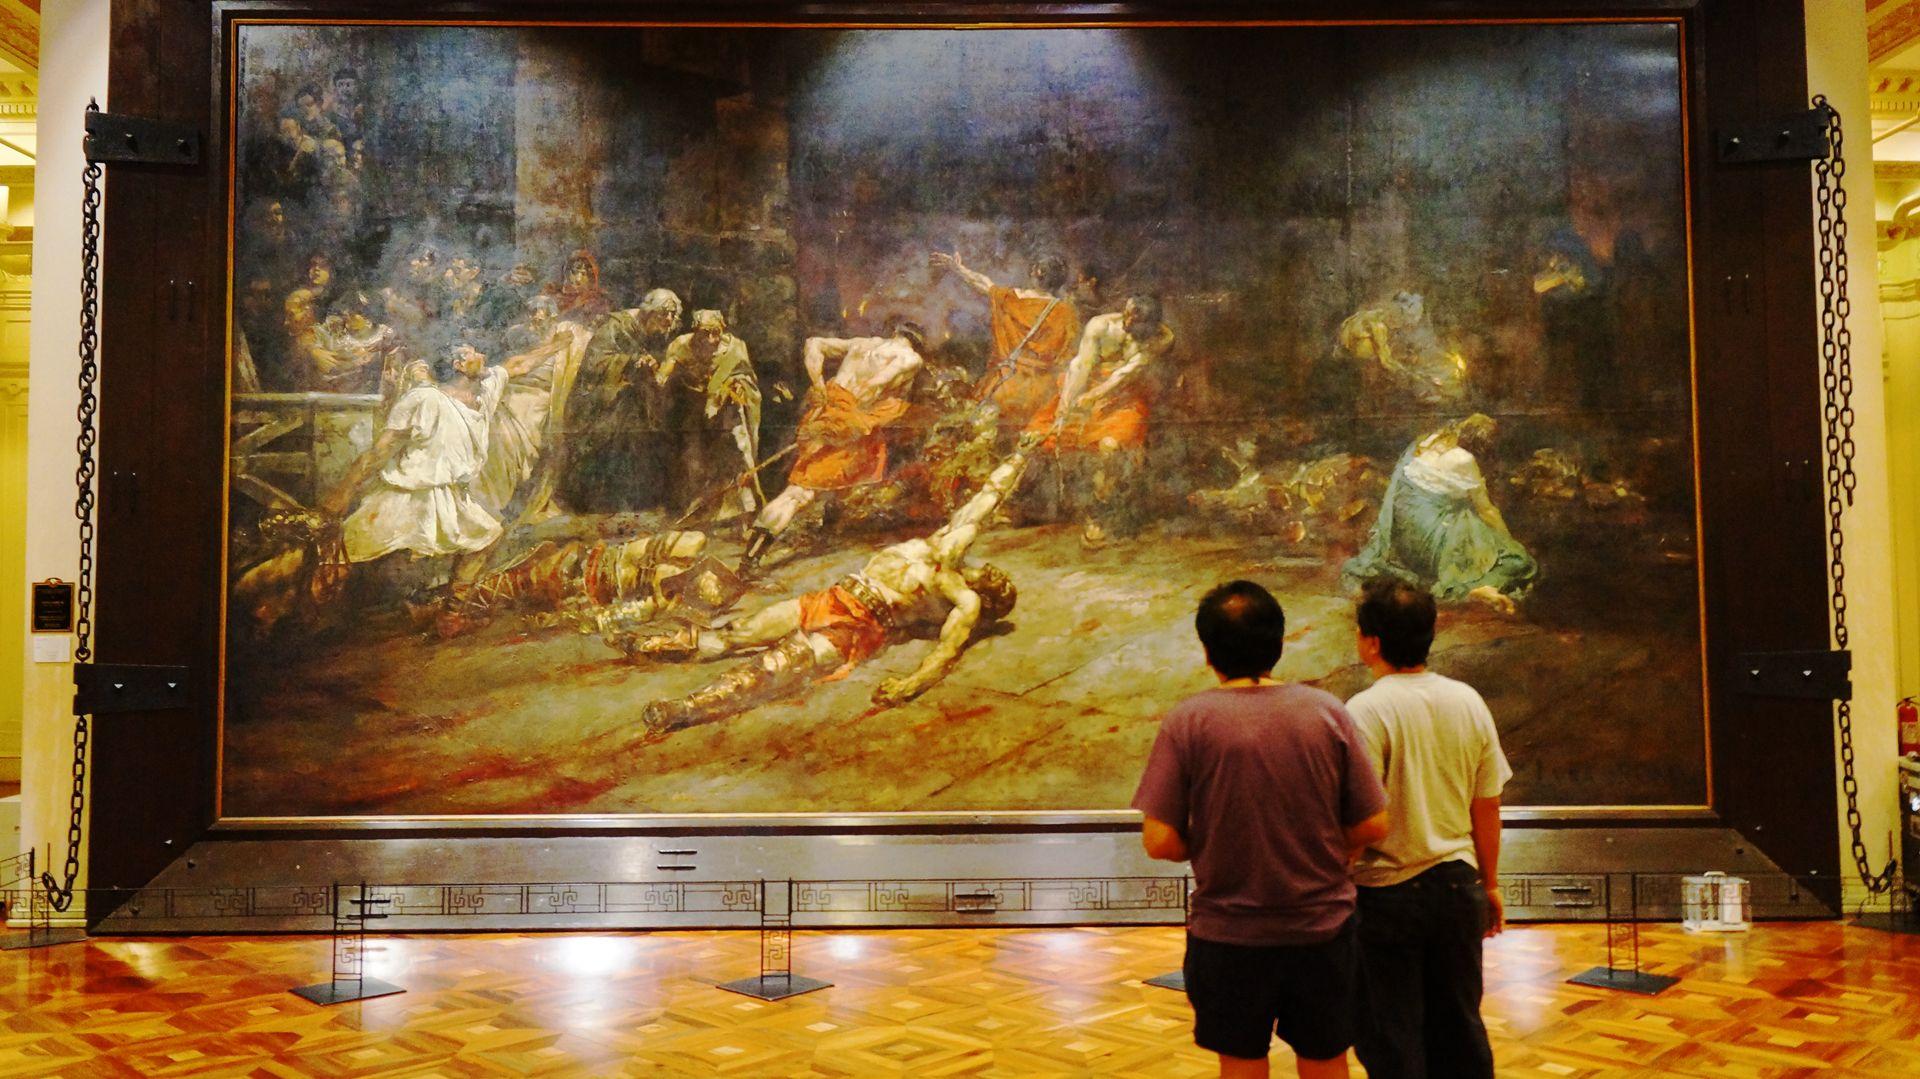 Philippine Artworks With Contested Histories: Felix Hidalgo's Masterpiece, Juan Luna's Women, Jose Rizal's Wedding And More